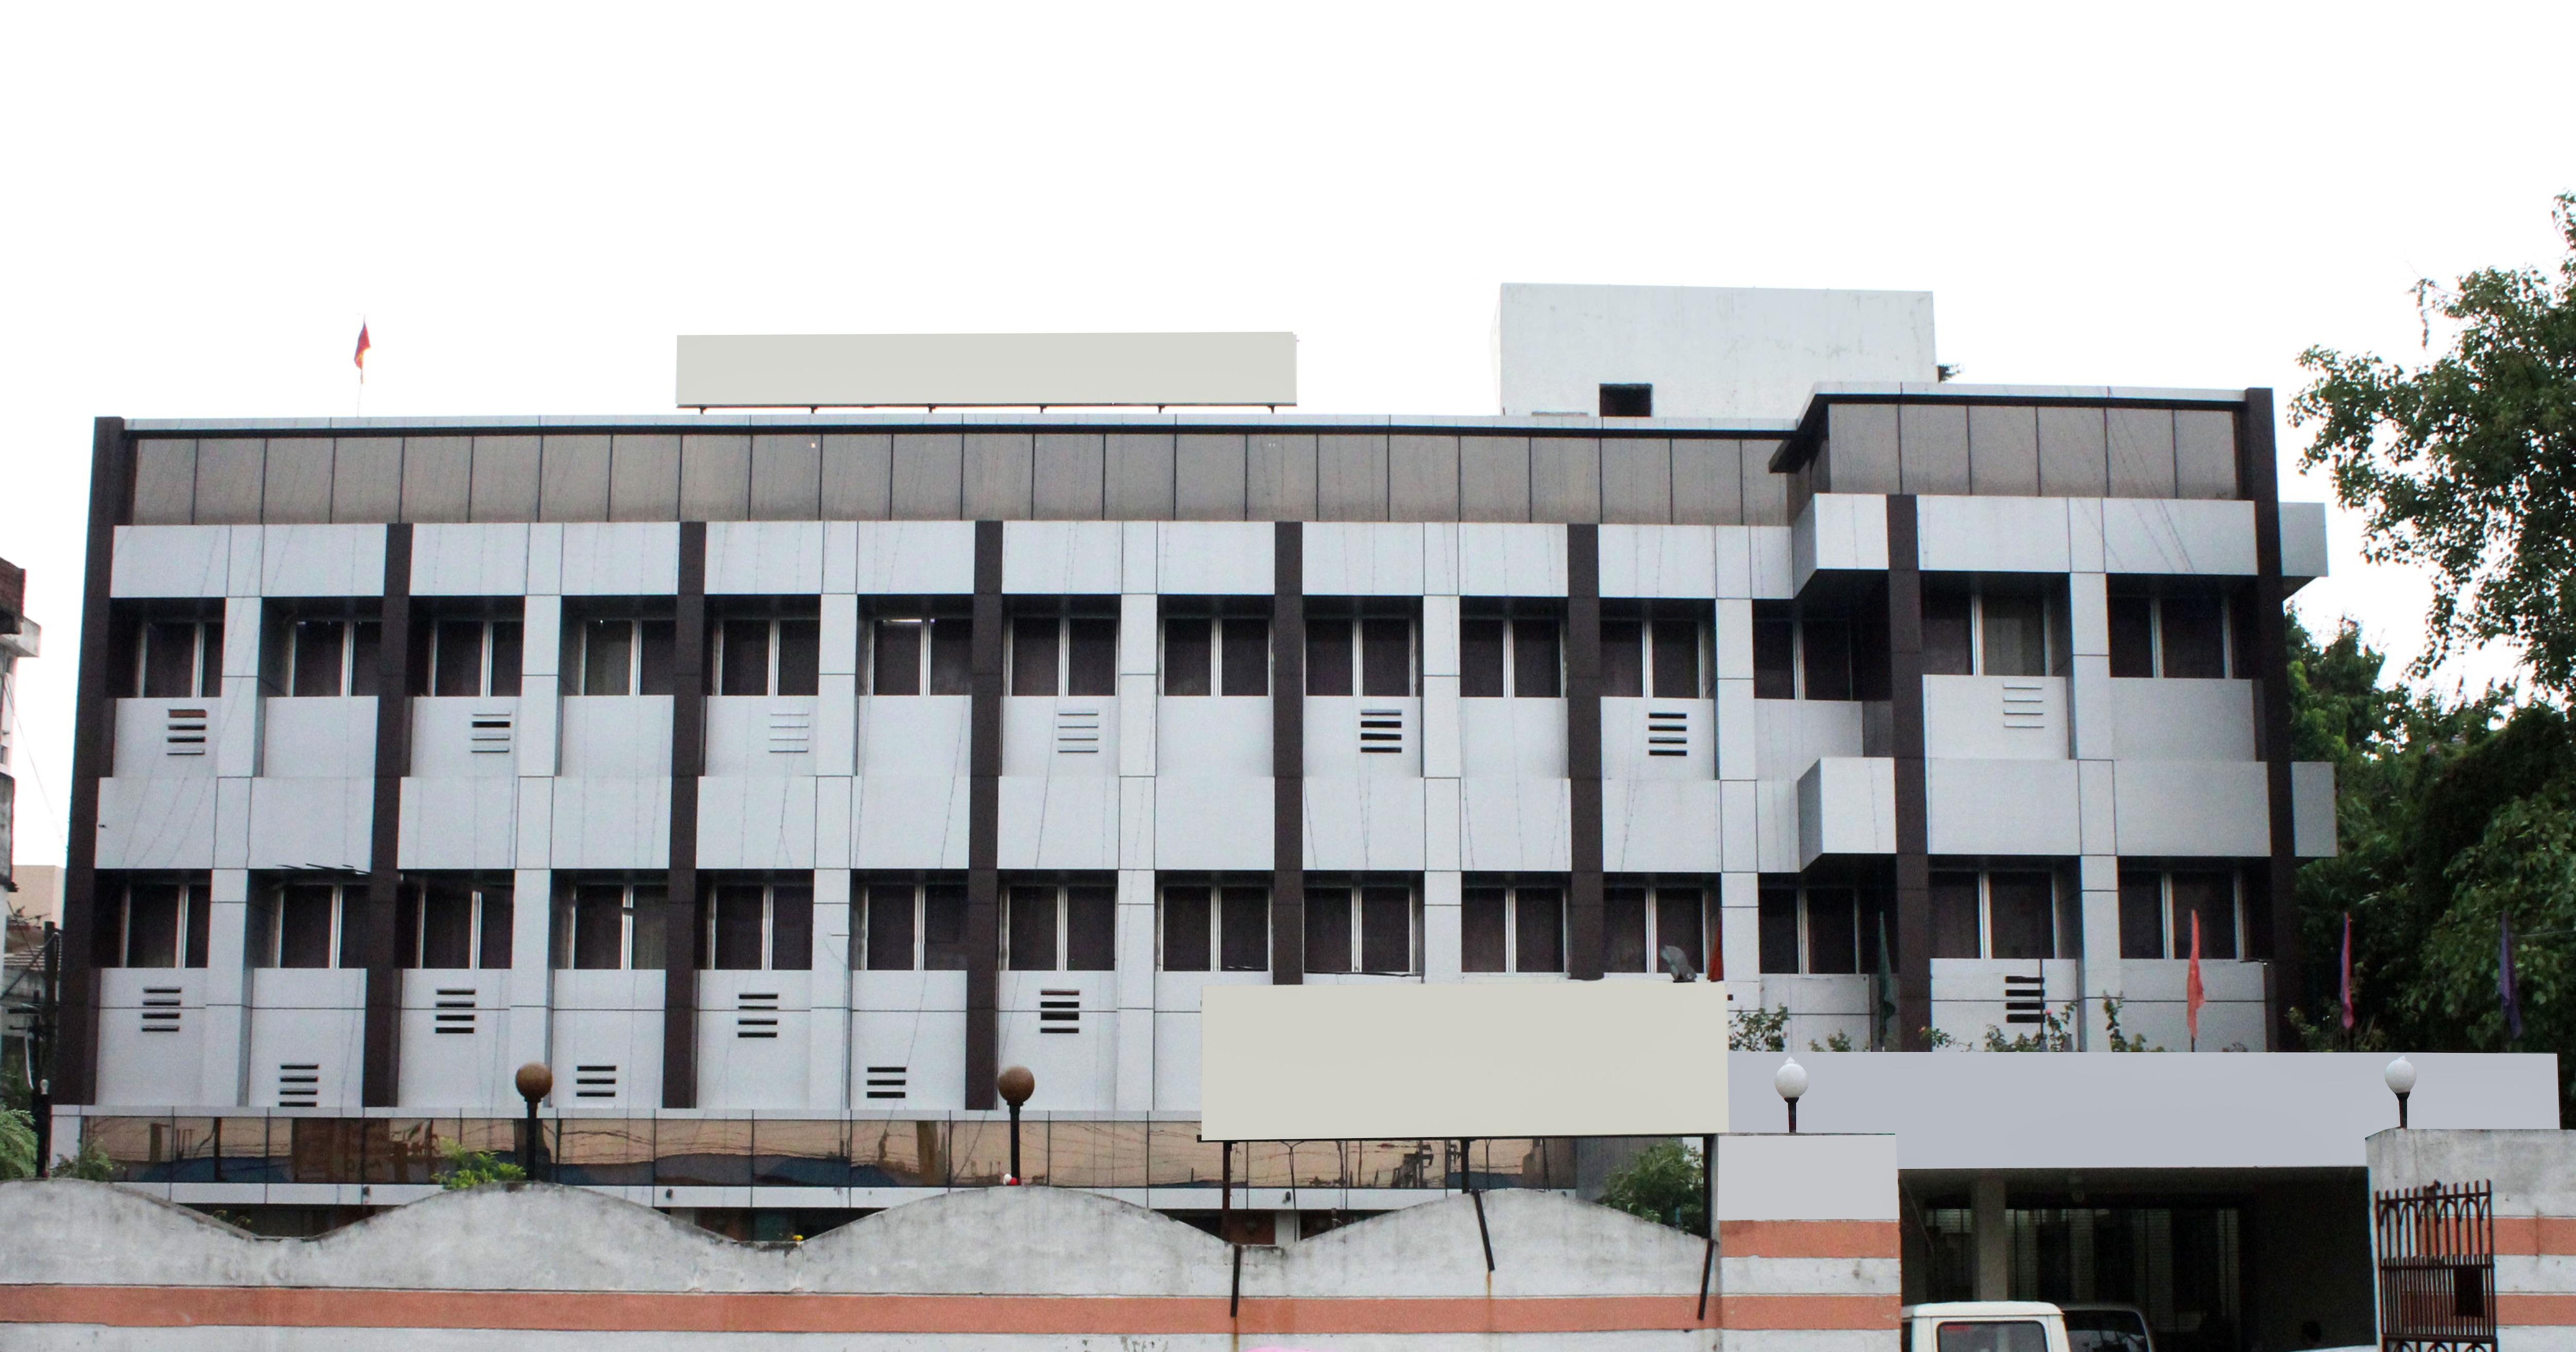 OYO 5264 Hotel Kwality Inns in Ranchi